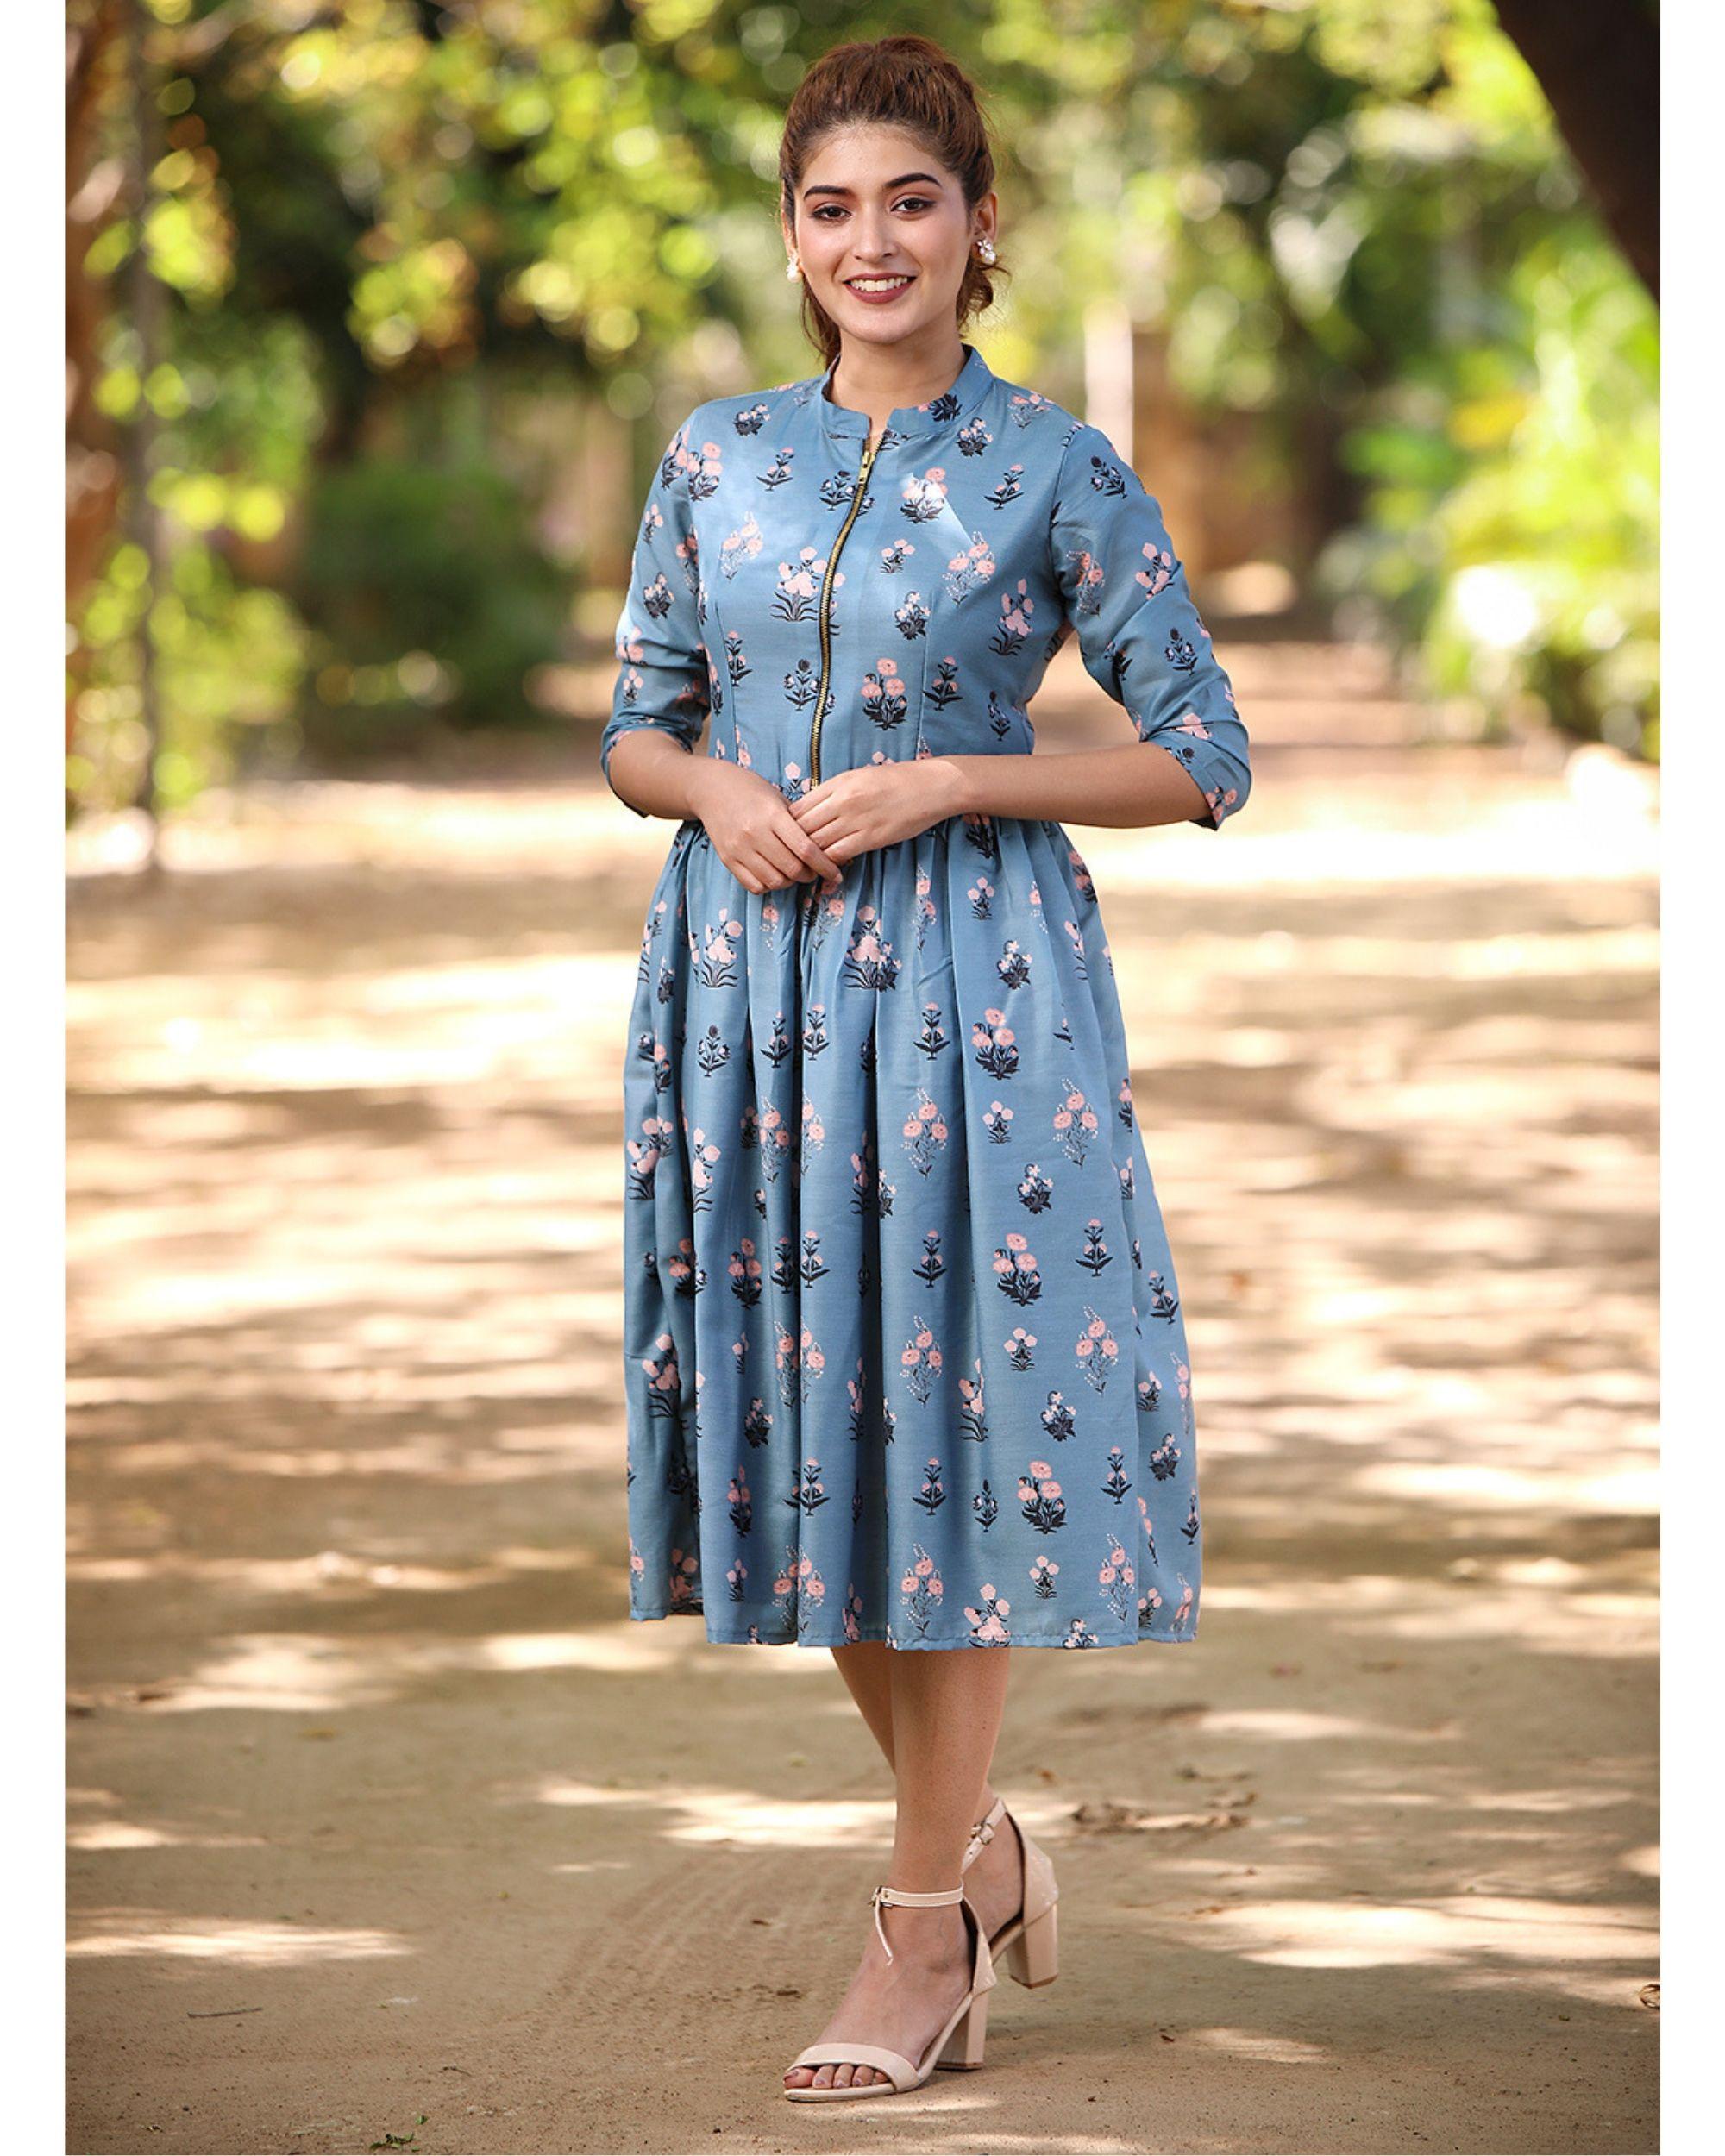 Dusty cyan blue floral zipper midi dress